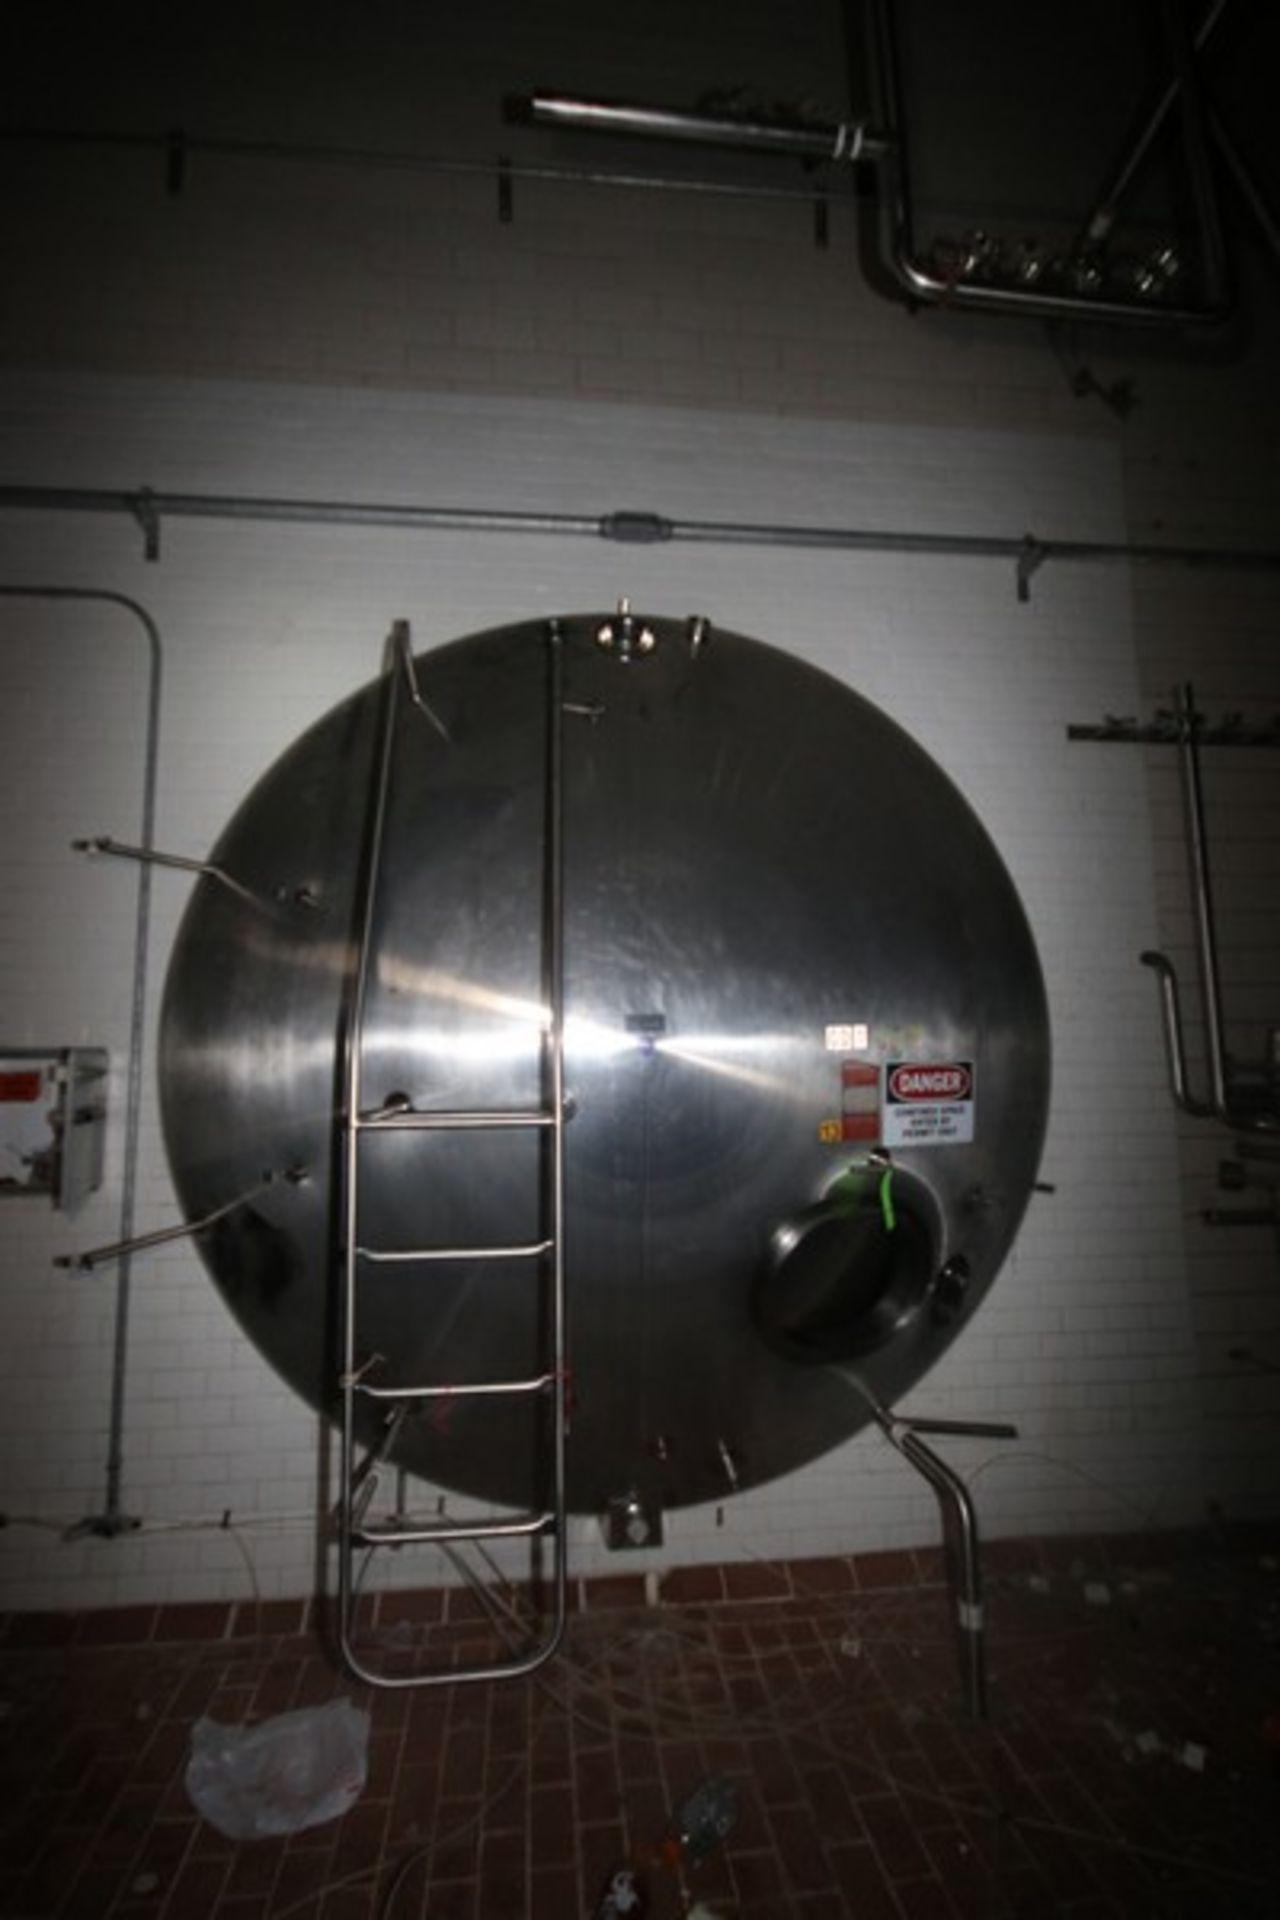 "Walker Aprox. 9,500 Gal. S/S Horizontal Tank, S/N 1520, Tank Dims.: Aprox. 108"" Diameter x 20' Long,"